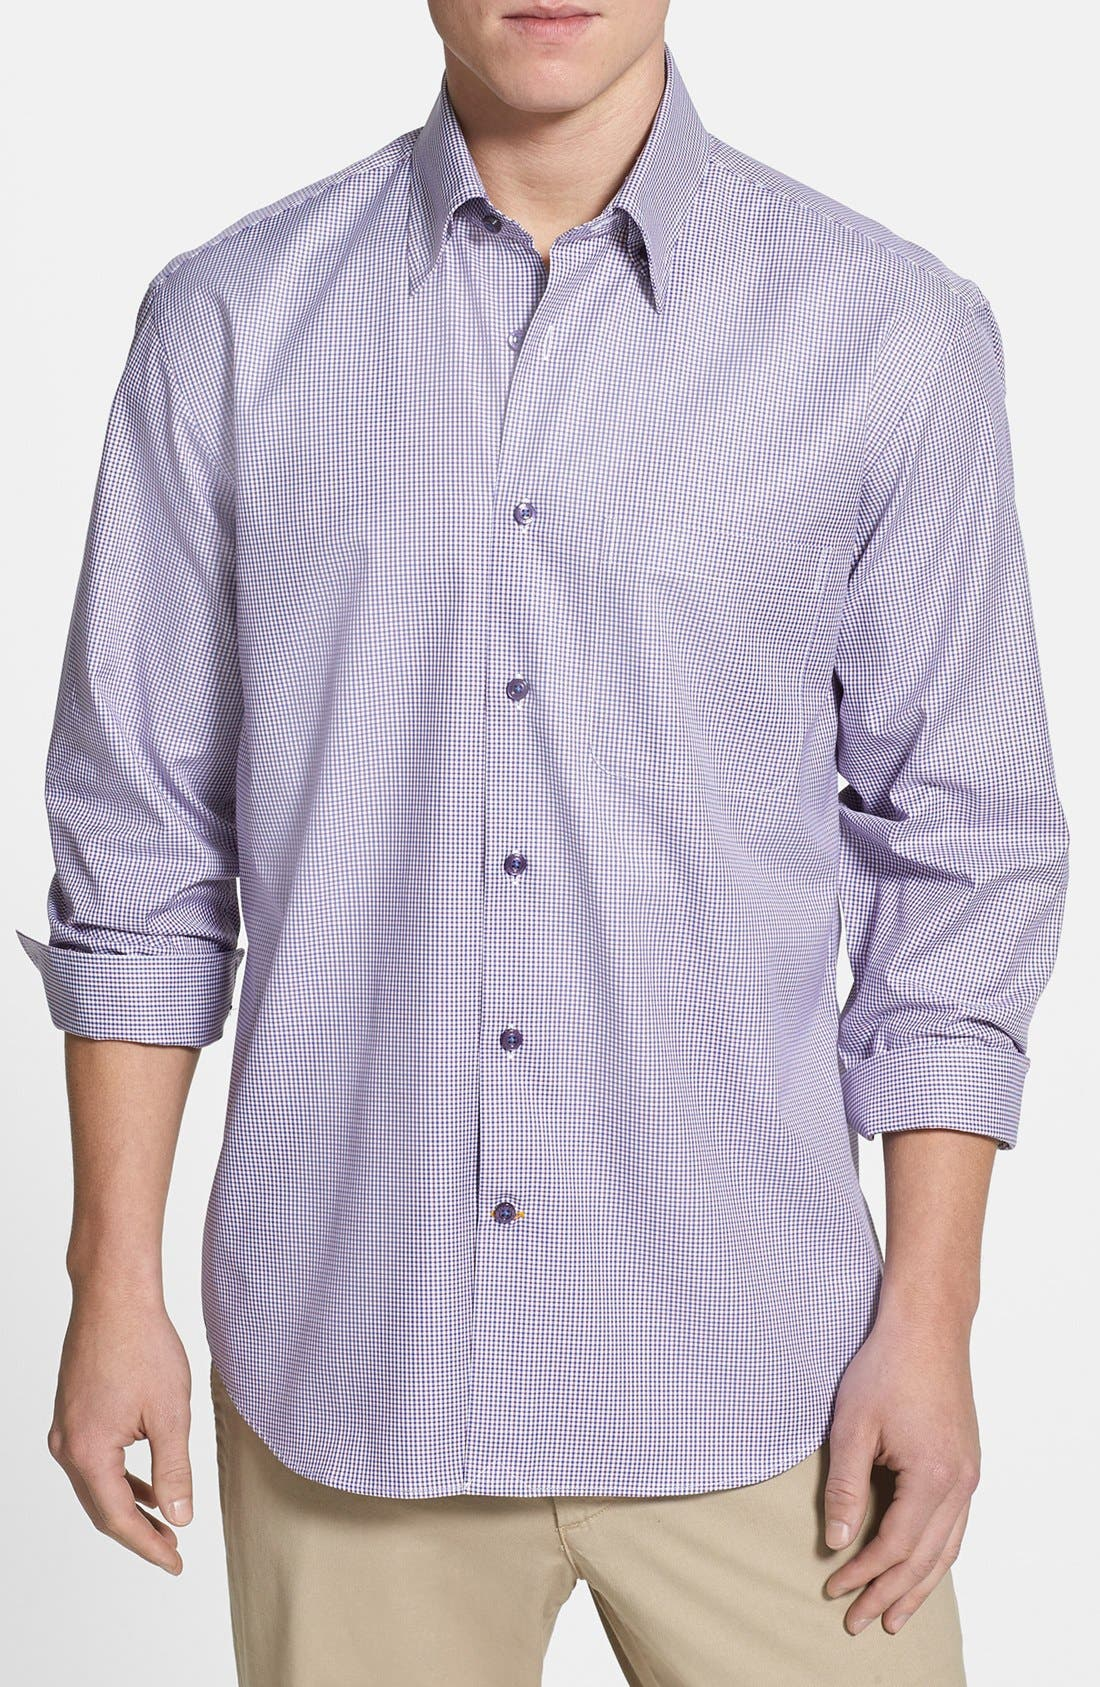 Alternate Image 1 Selected - Robert Talbott Classic Fit Sport Shirt